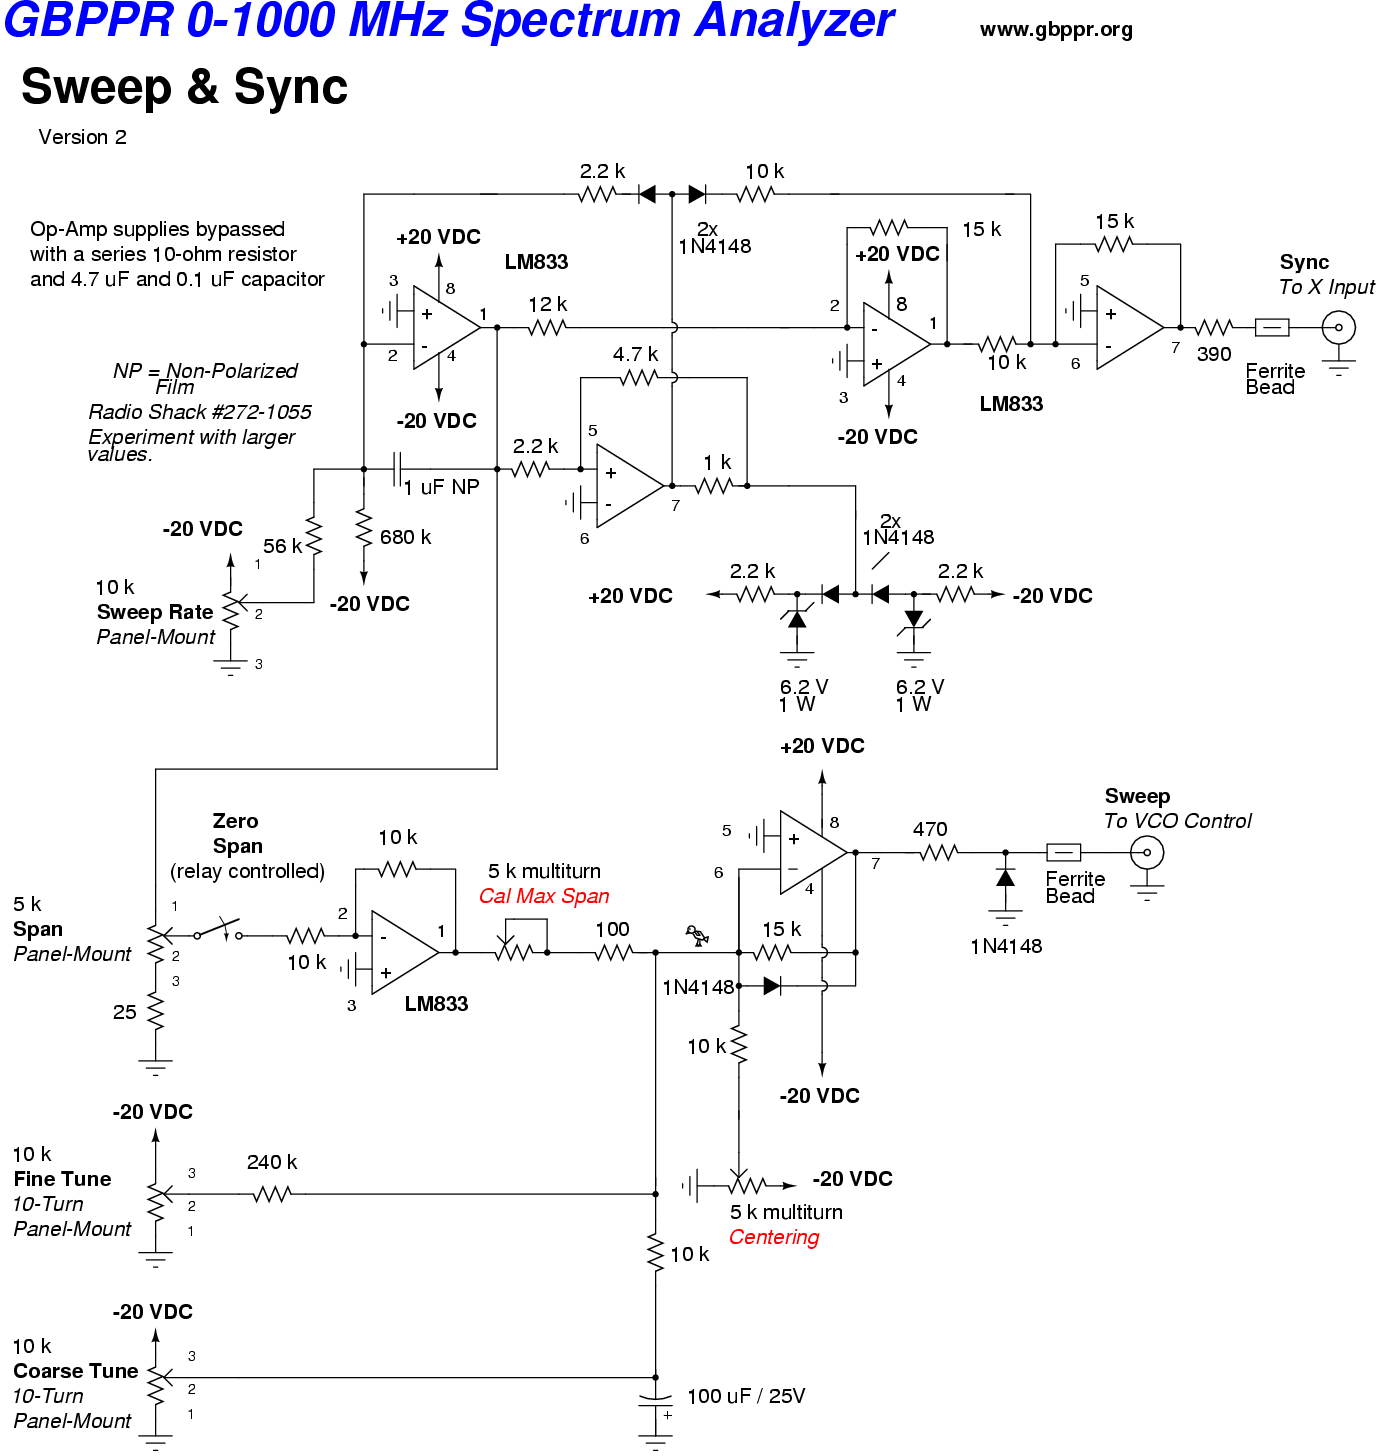 audio spectrum analyzer circuit diagram floor of mouth gbppr 1000 mhz